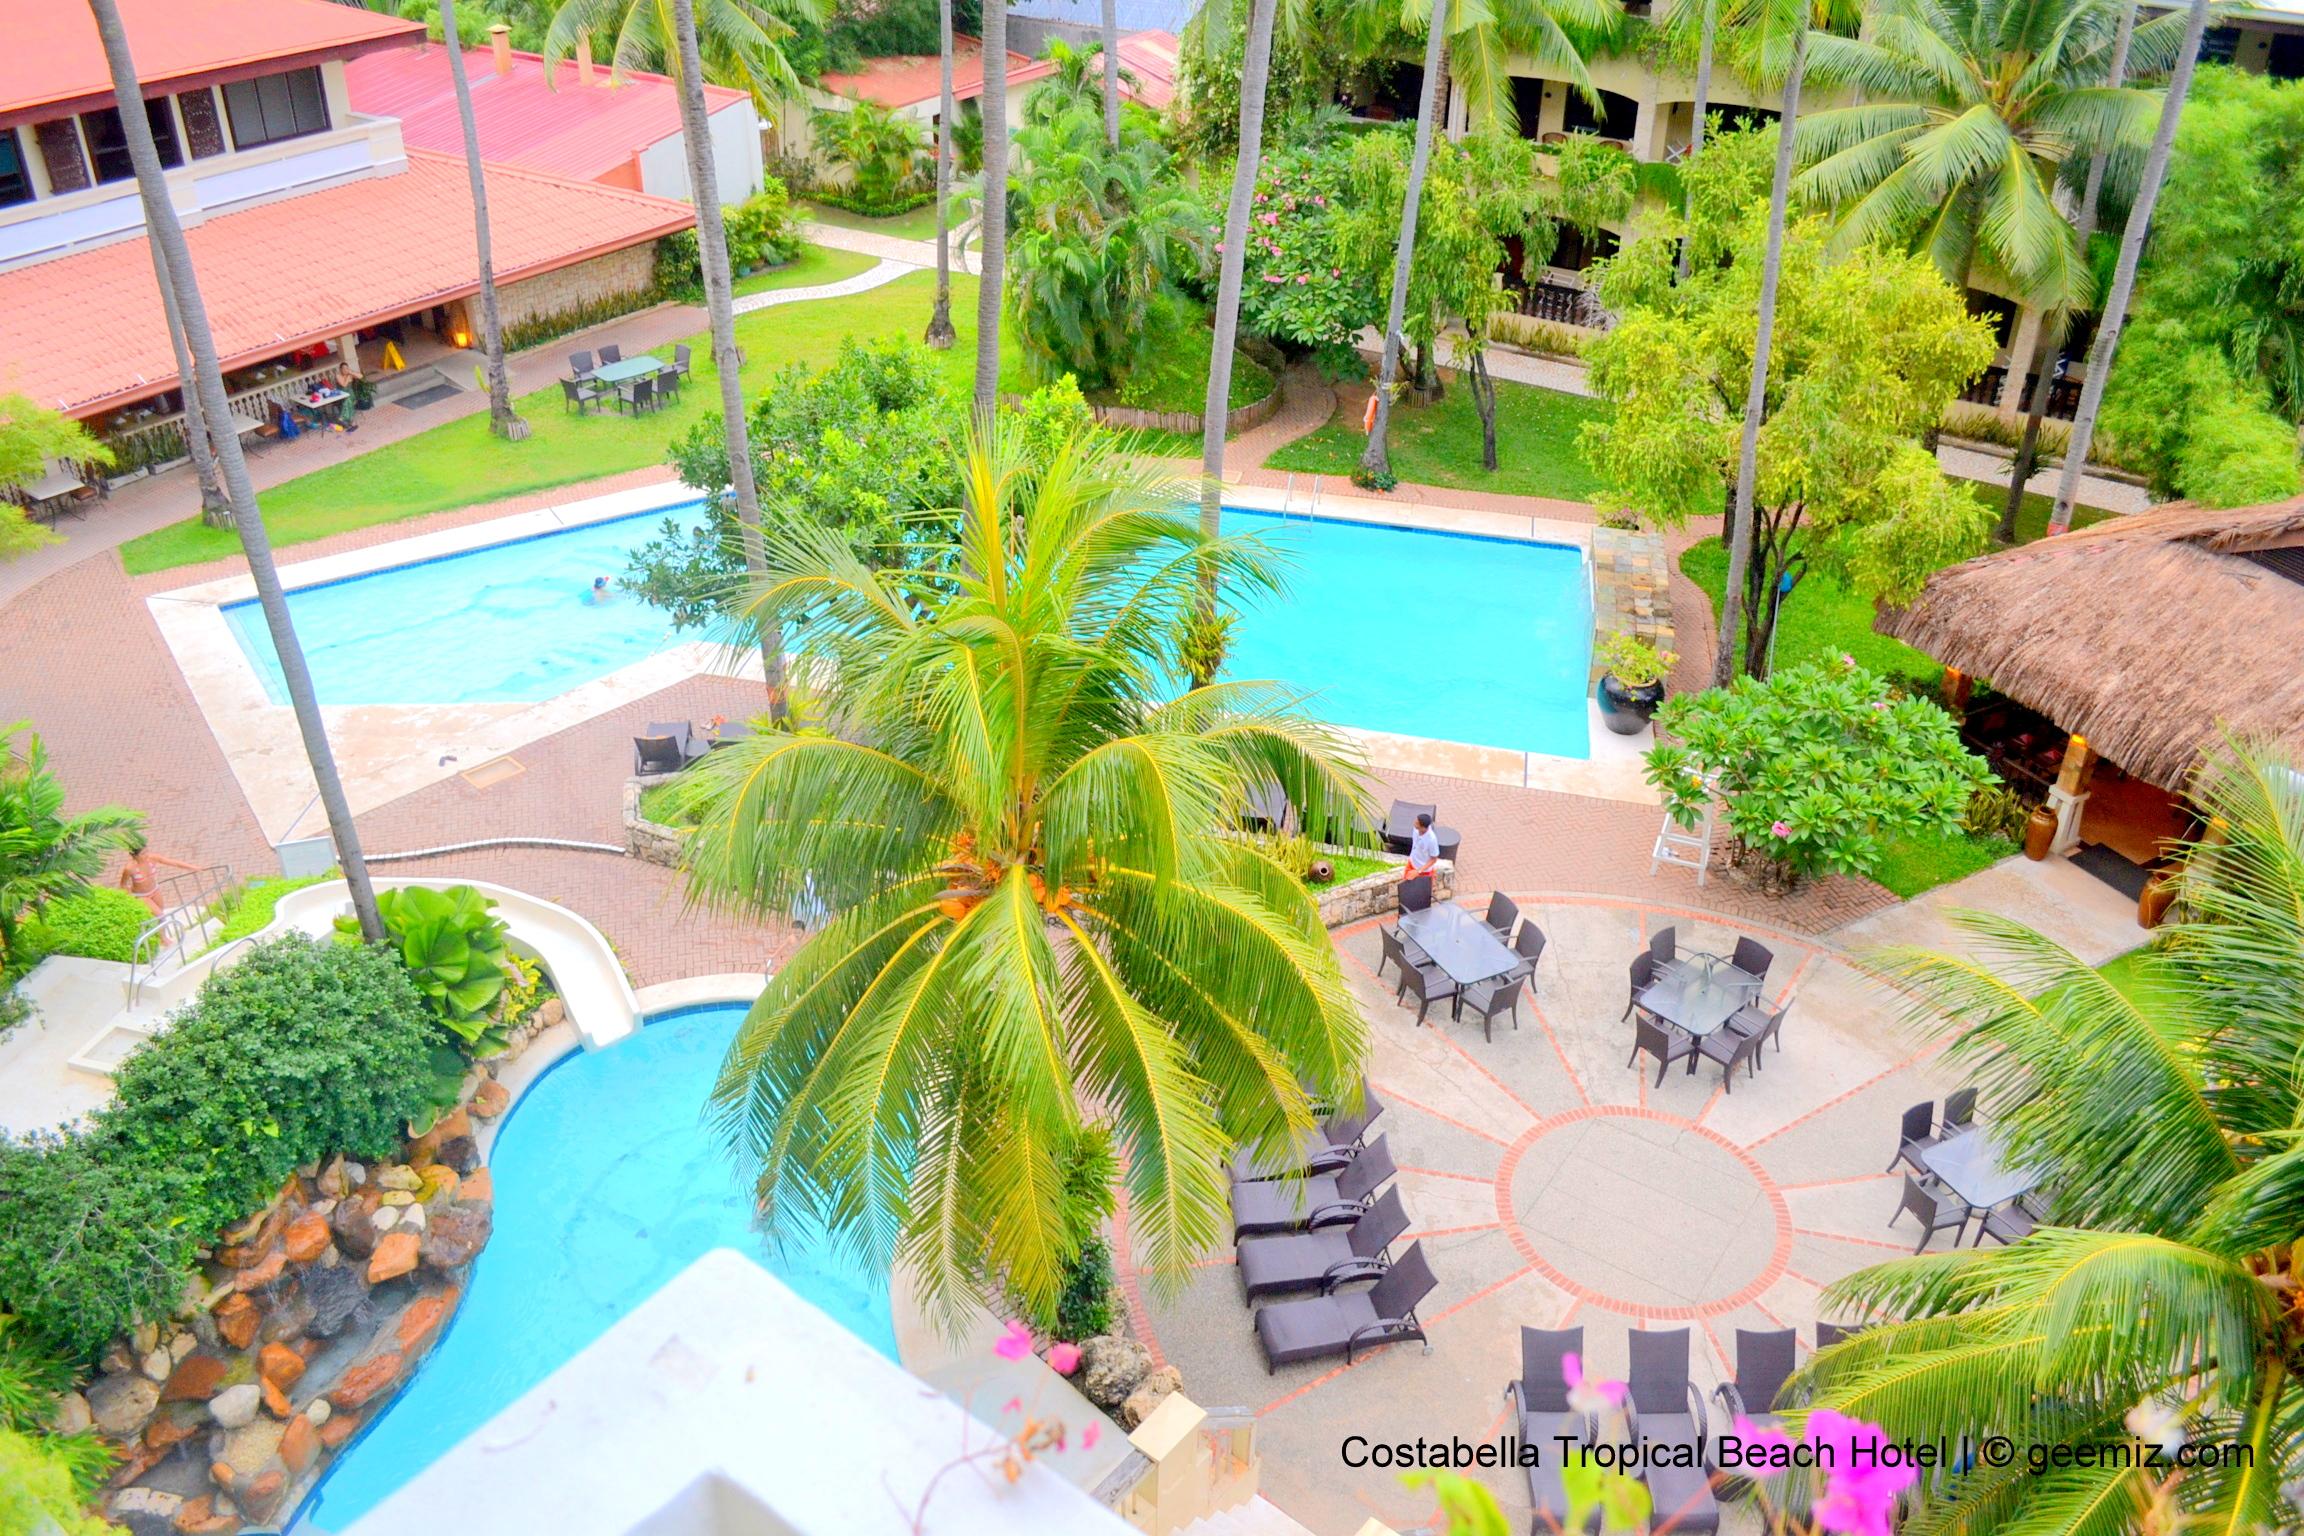 Geemiz Review: Costabella Tropical Beach Hotel.